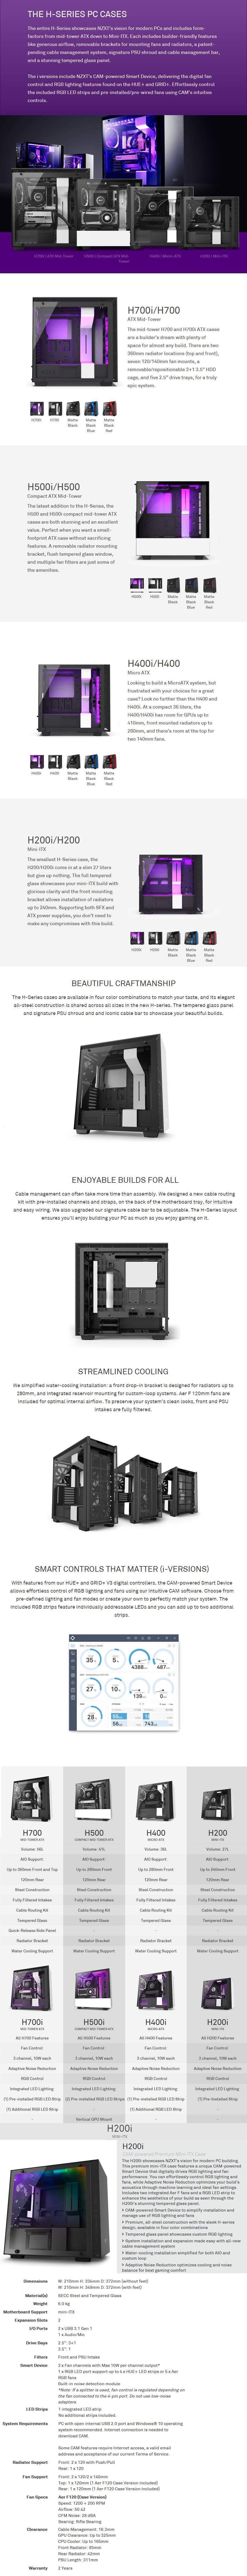 NZXT H200i Smart Tempered Glass Mini-ITX Case - Matte Black - Desktop Overview 1